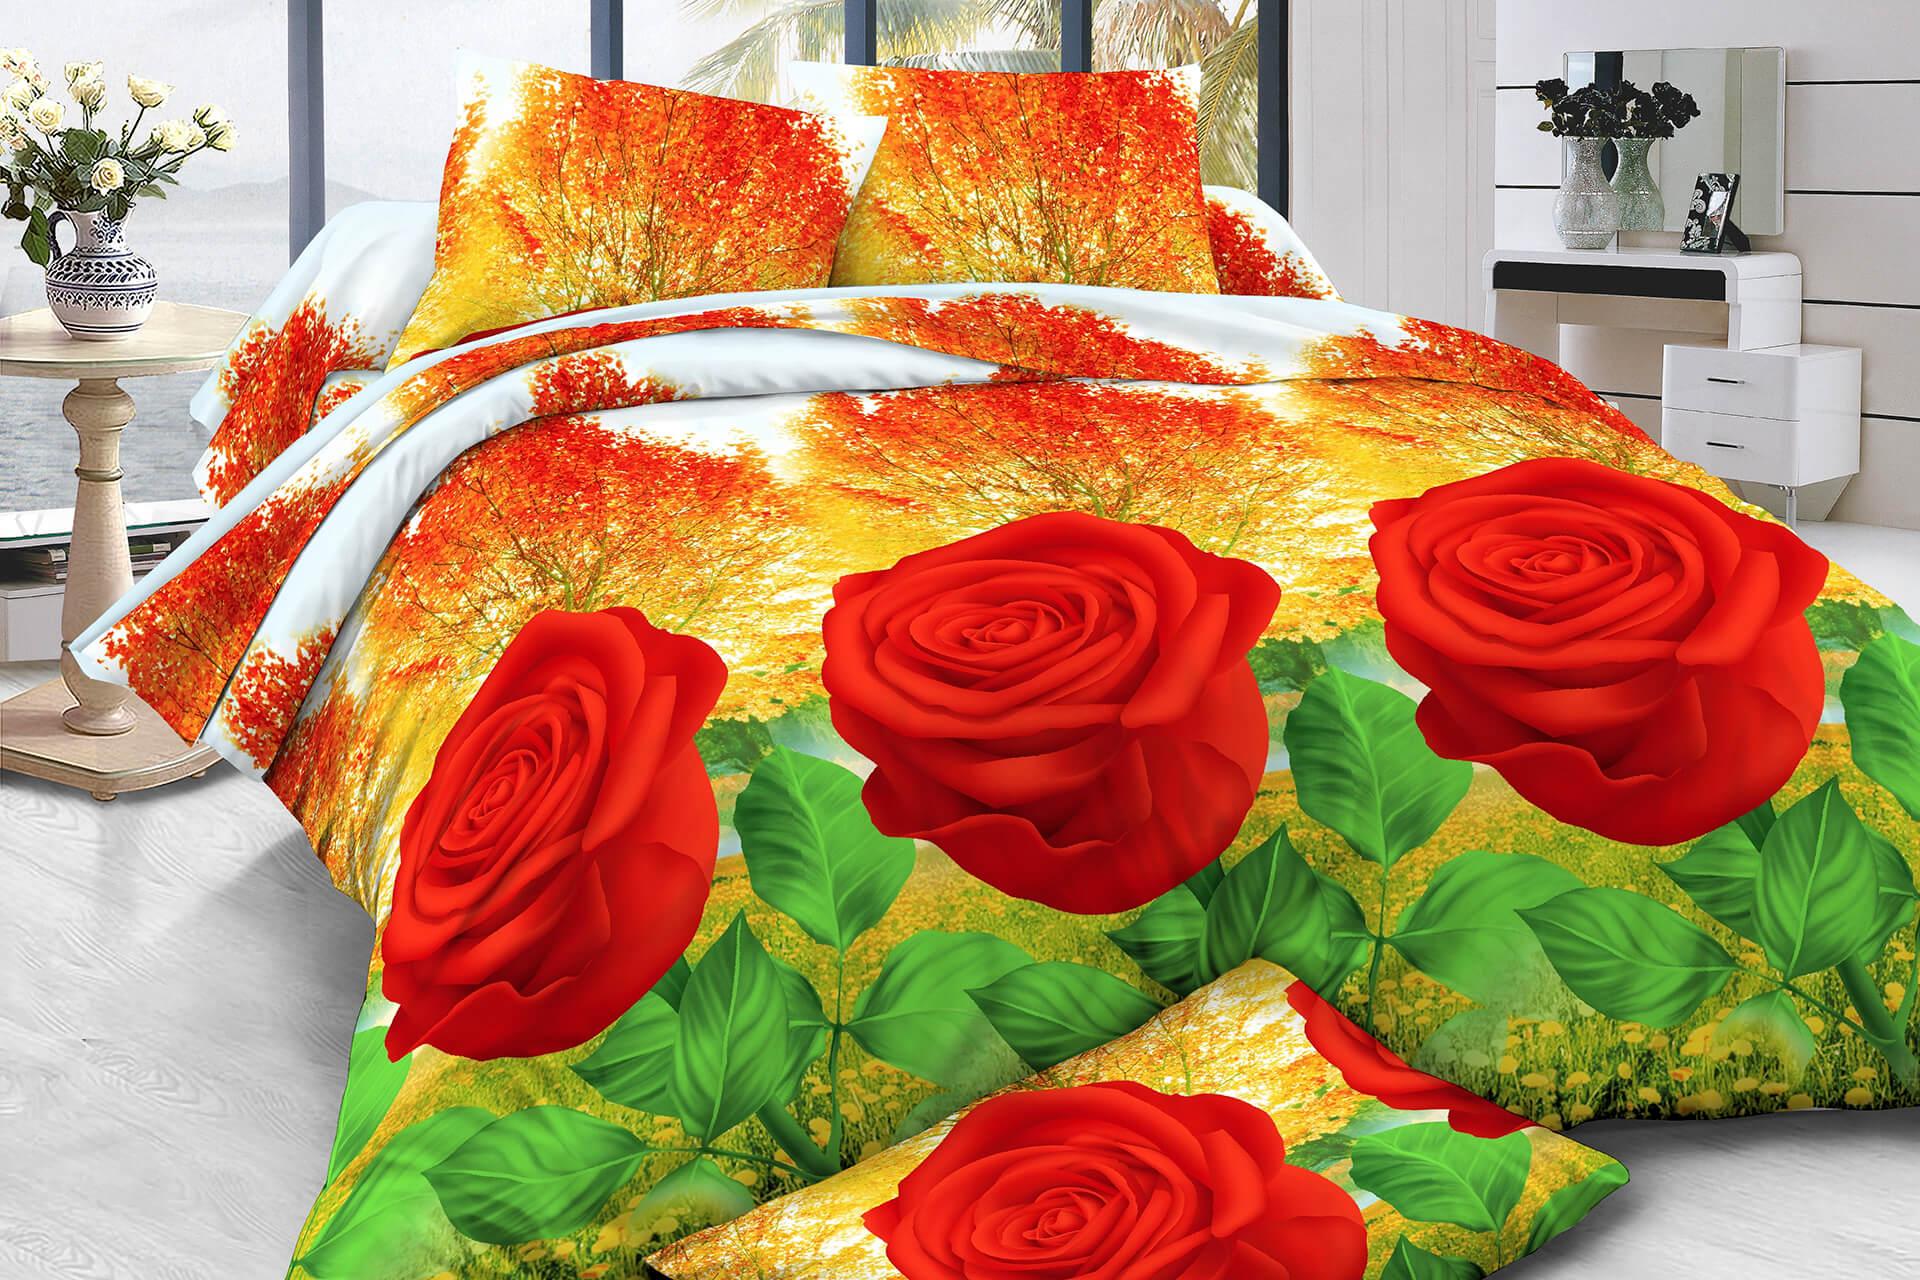 3D floral printing